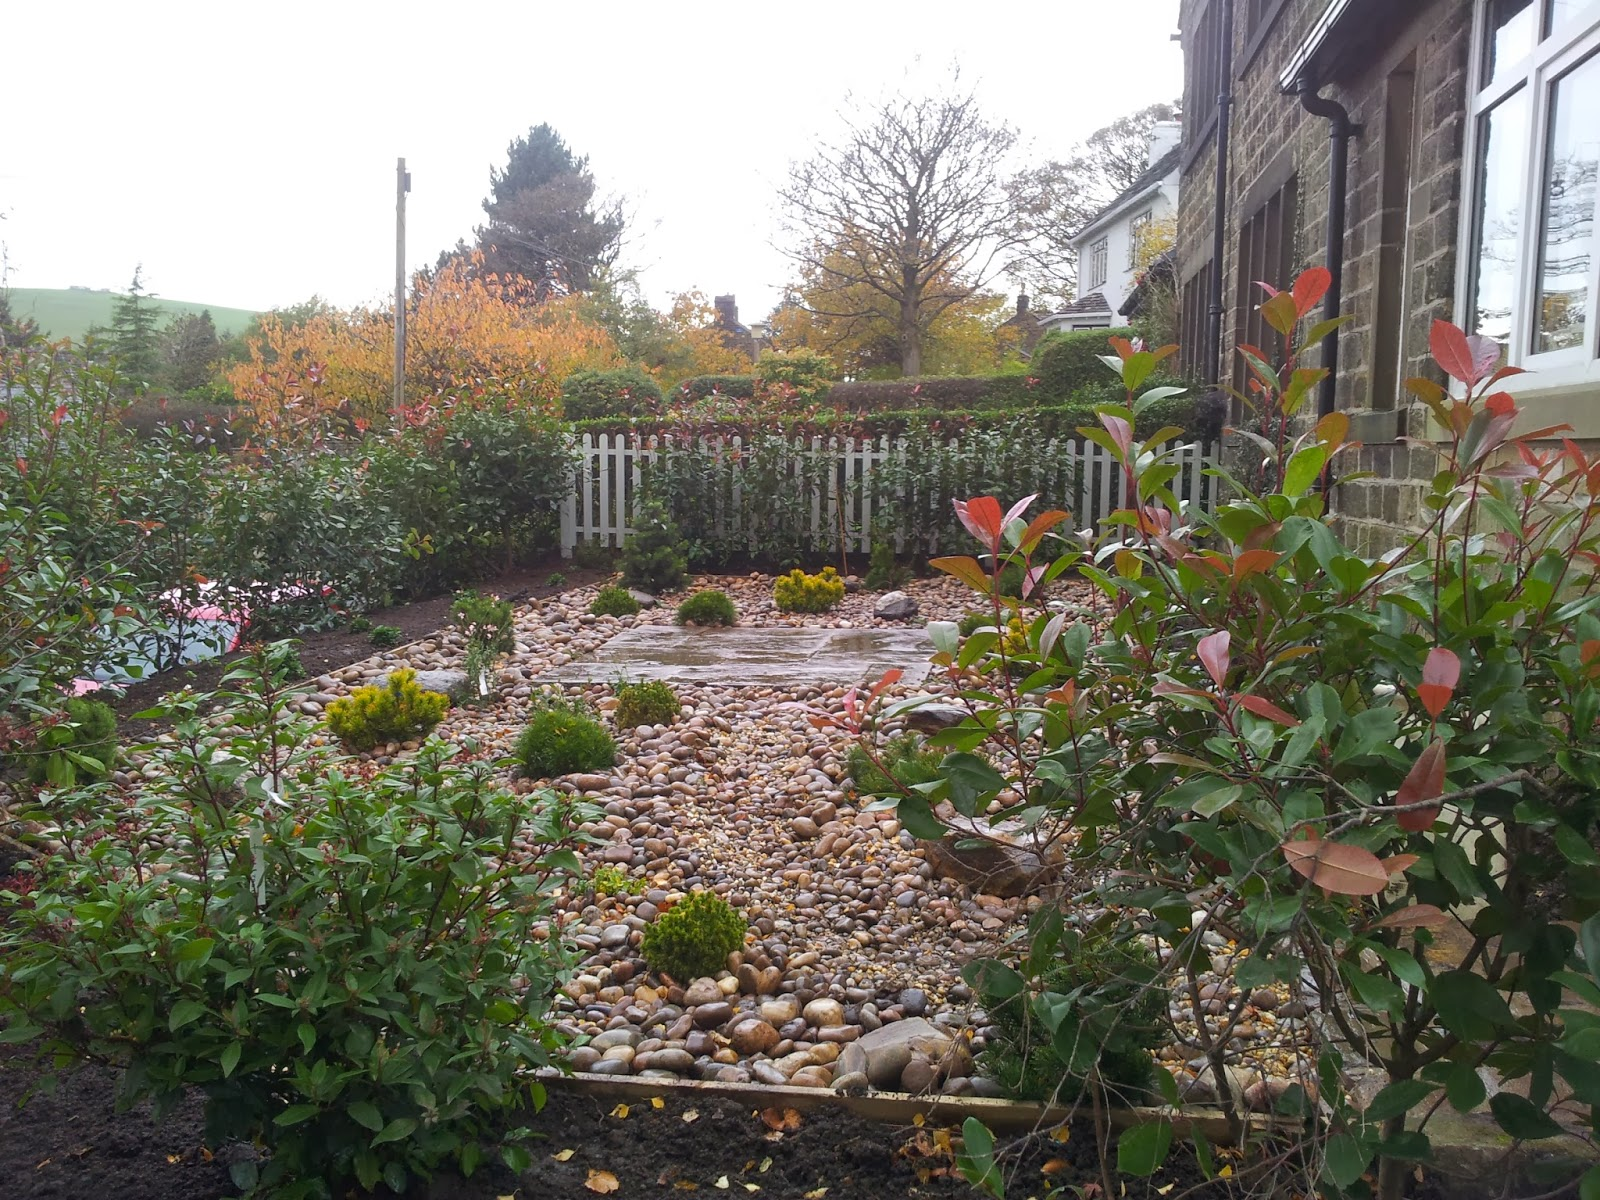 David Keegans Garden Design Blog: Garden Design Project in ...